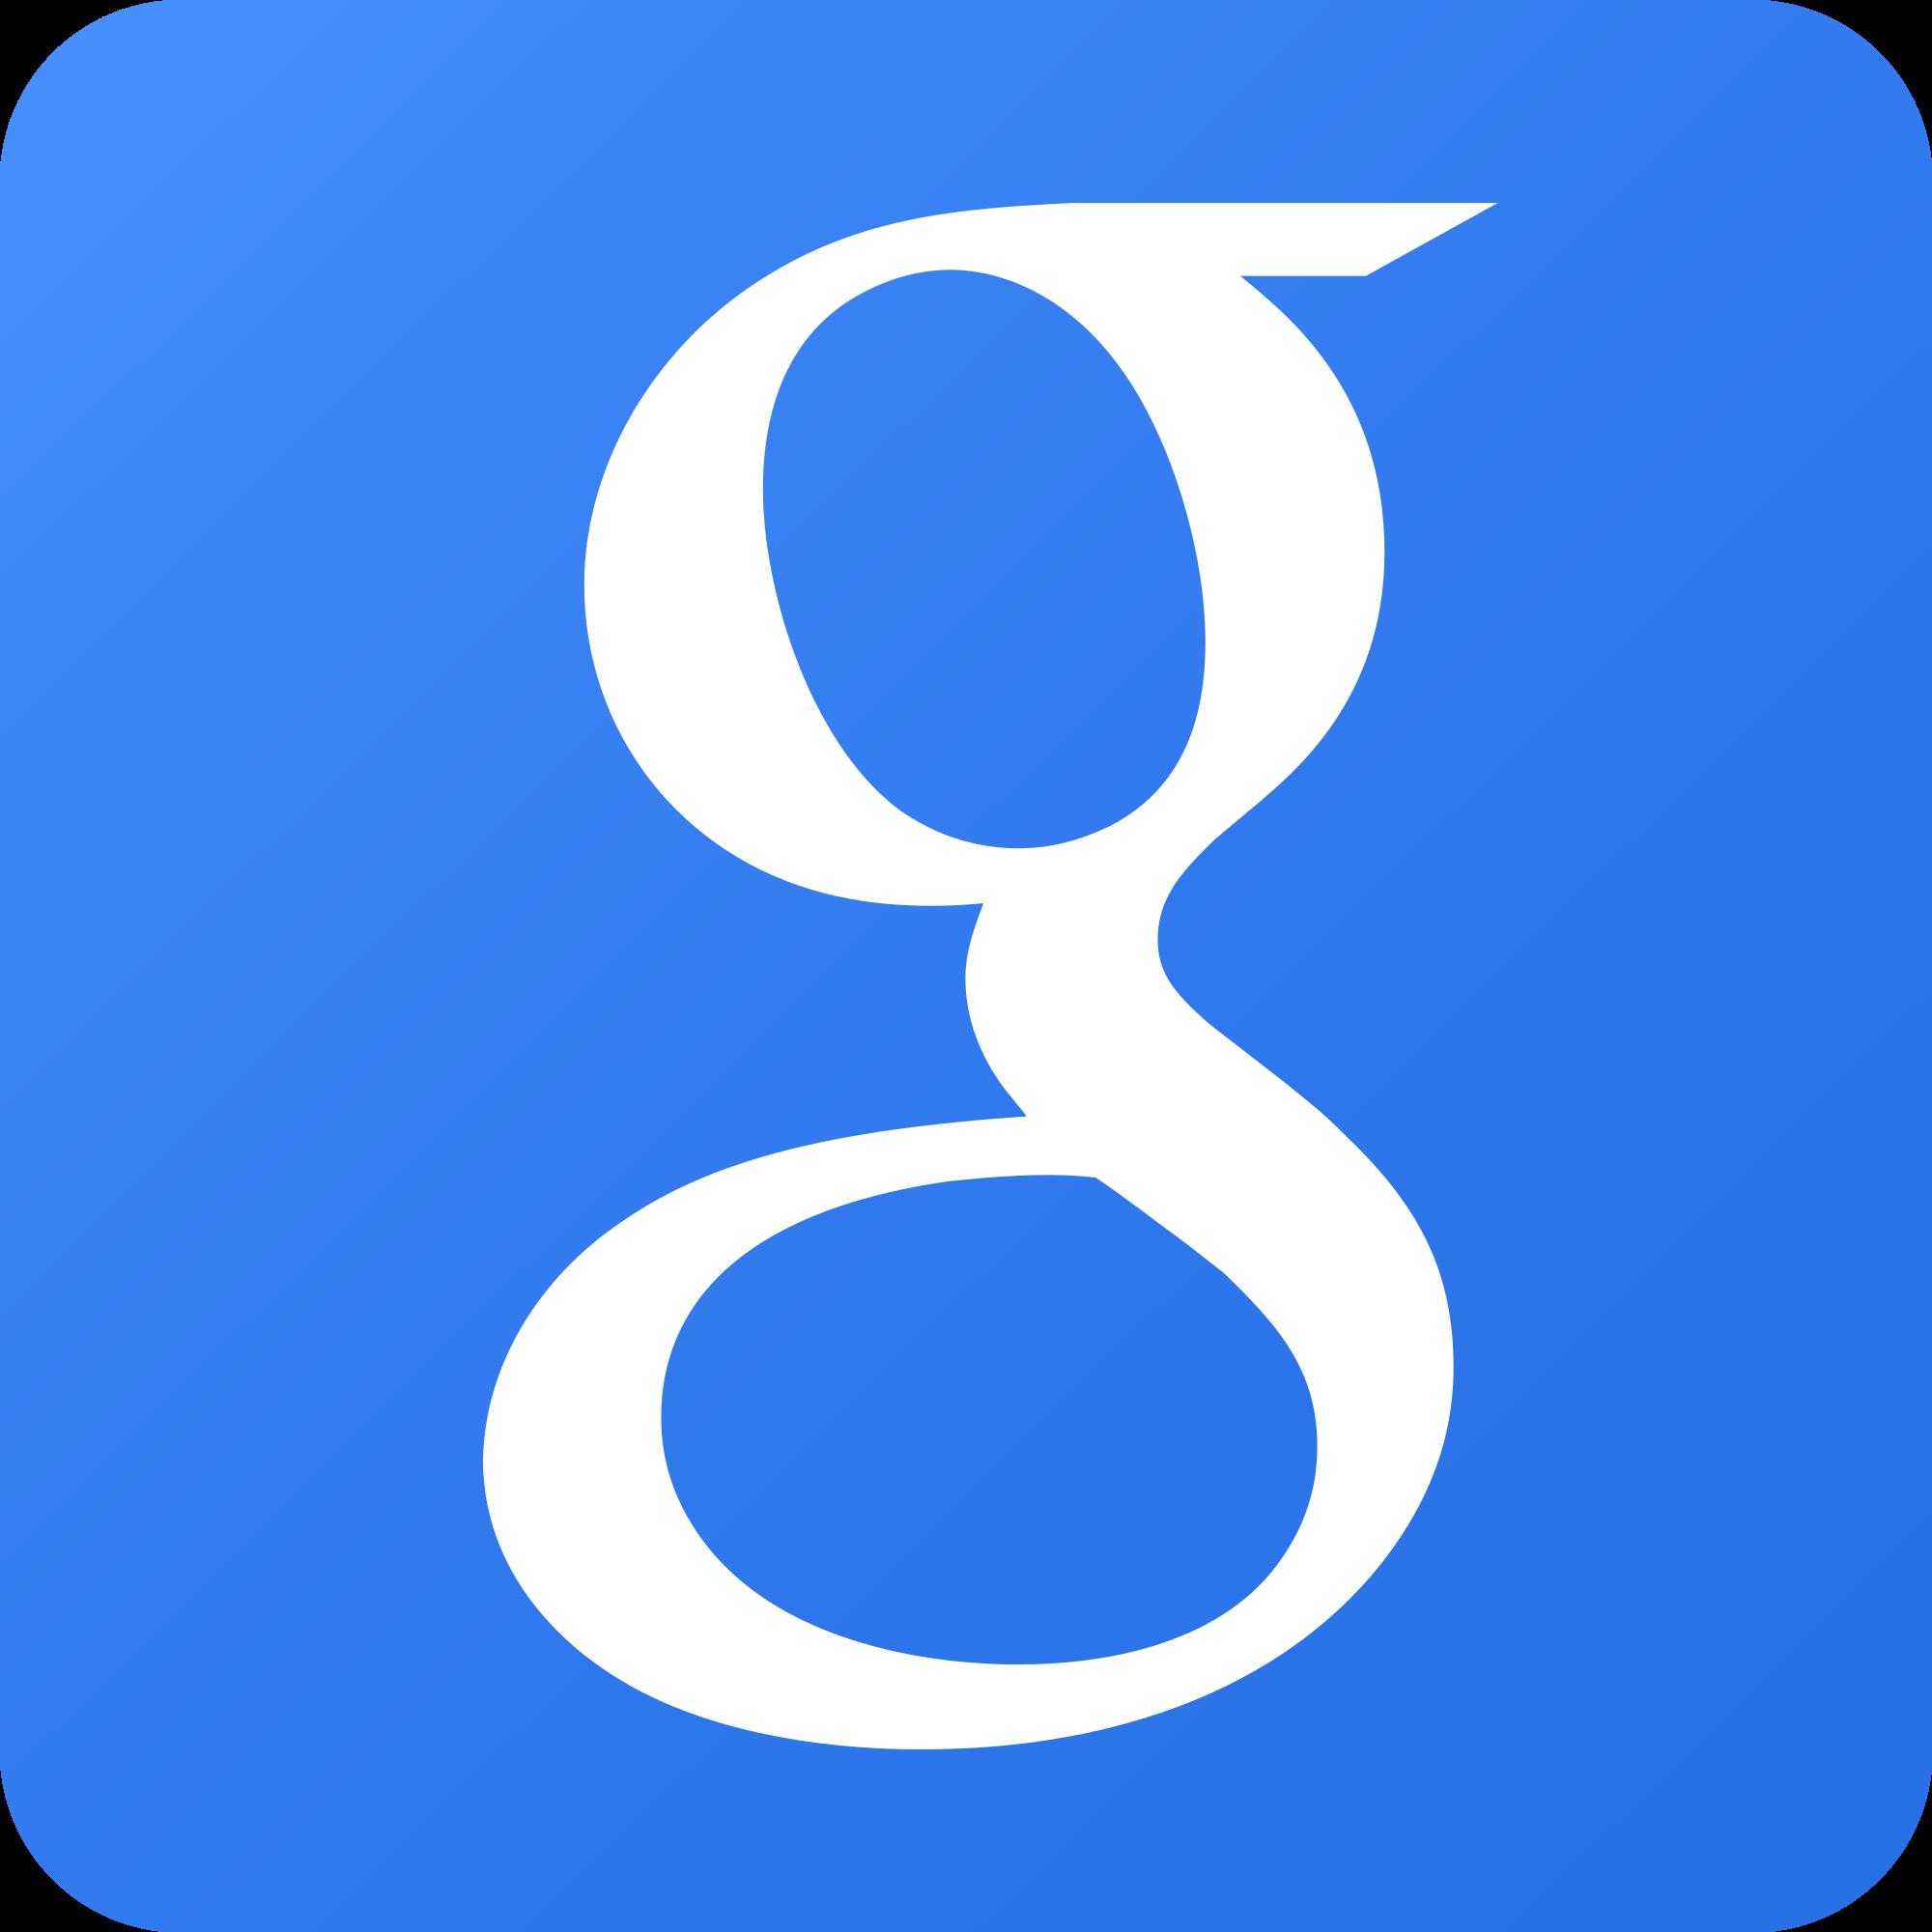 google blue logo g letter google blue logo g letter